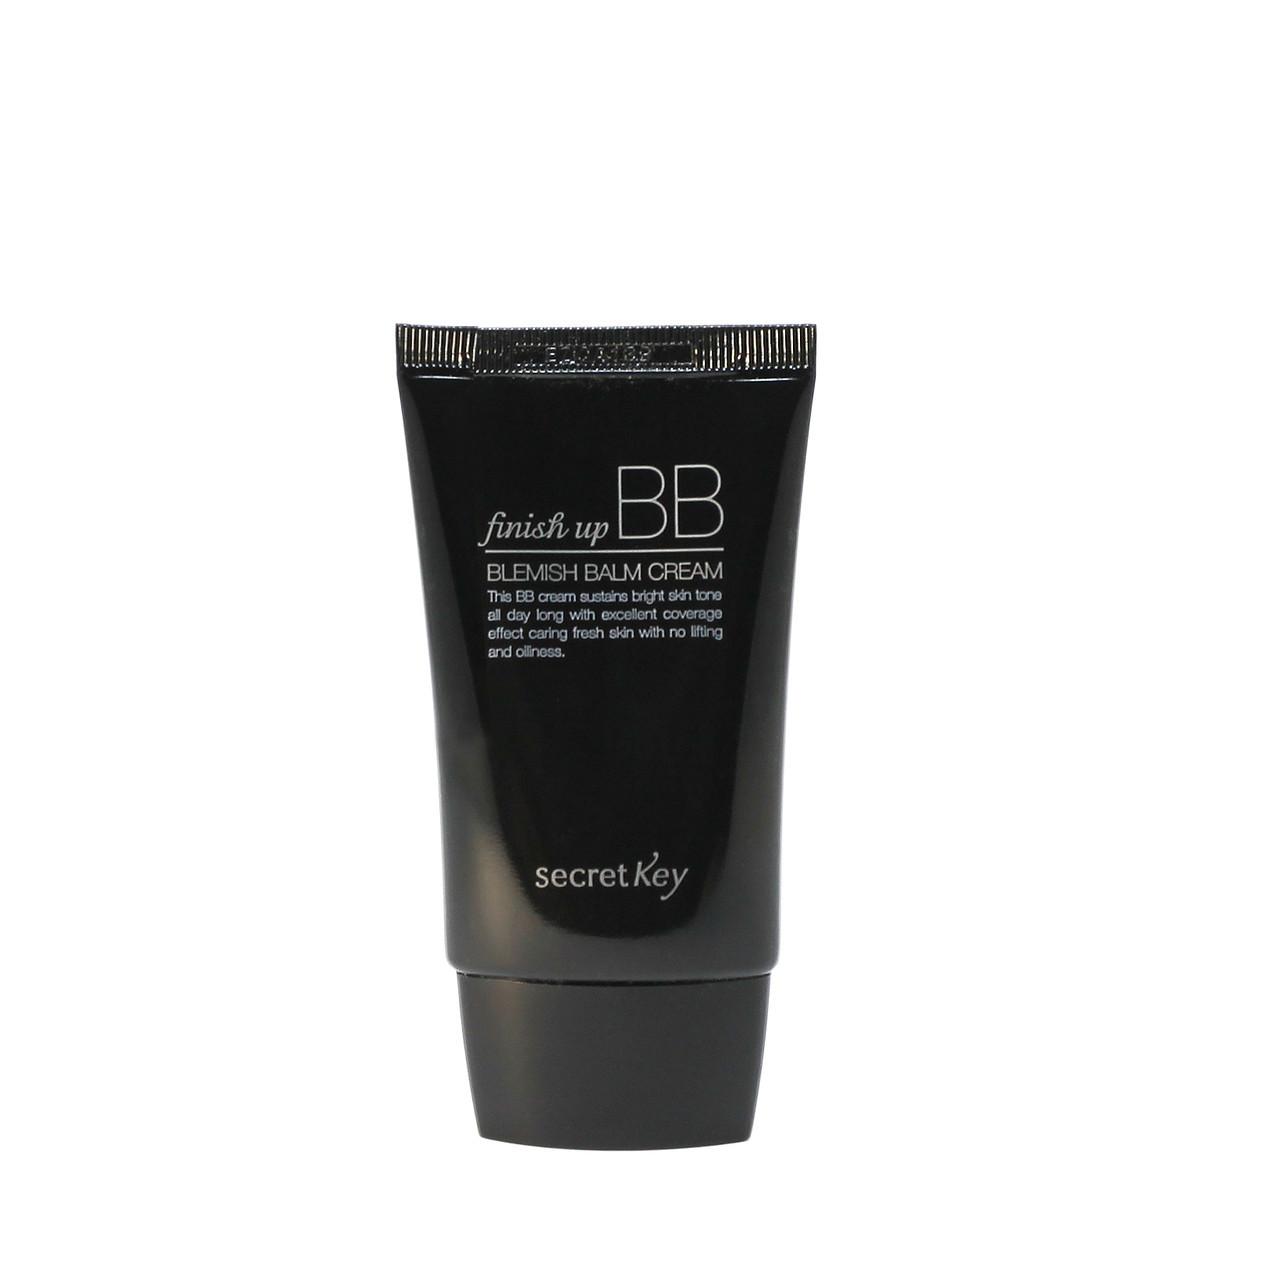 BB крем матирующий Secret Key Finish up BB Cream - 30 мл